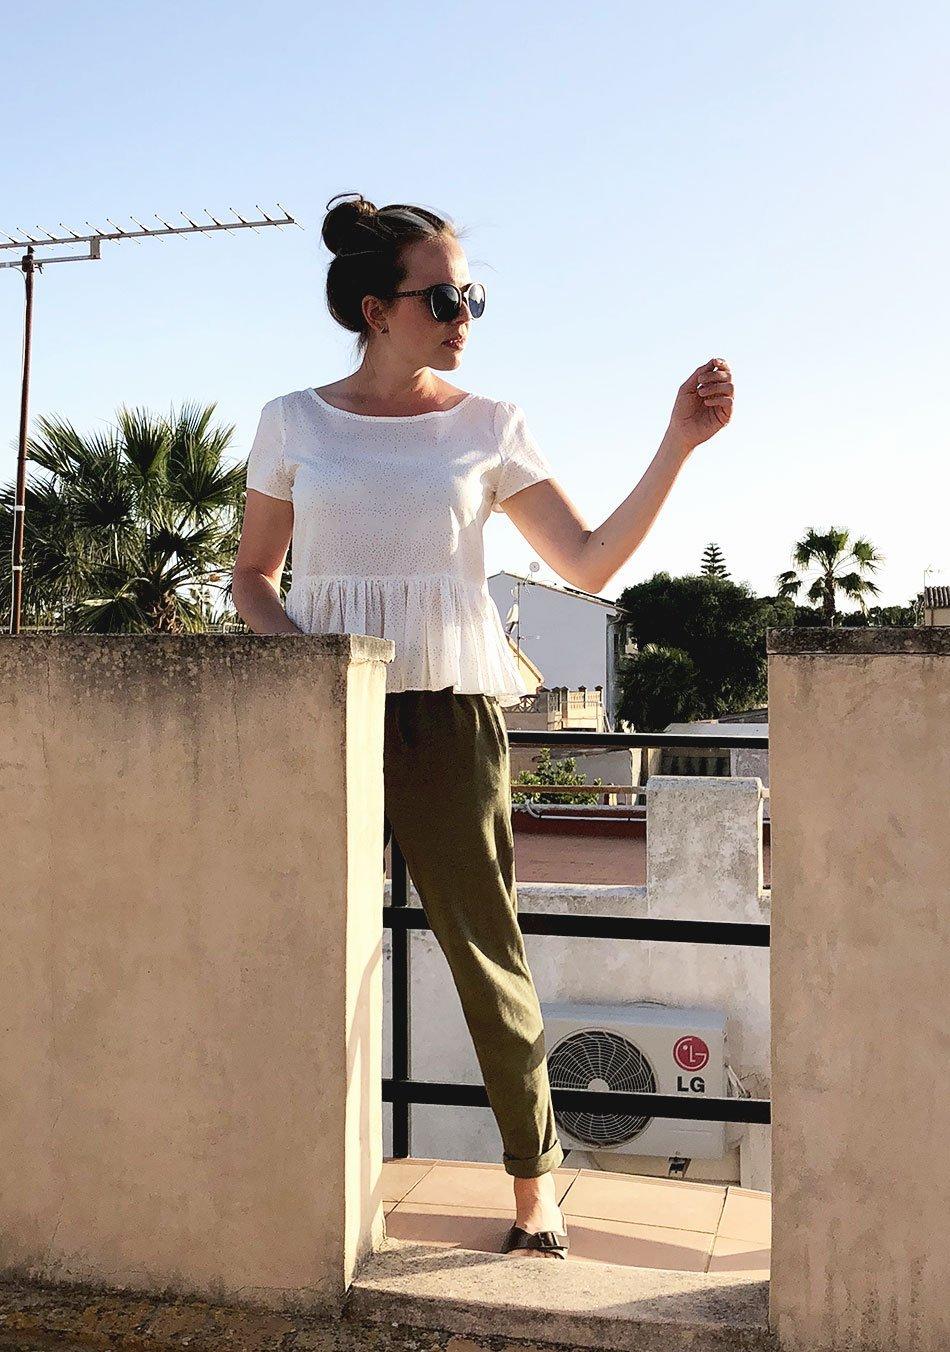 Sommermode, fair fashion, bluse, rüschen, gewinnspiel, dach, mallorca, cala llombards, lookbook